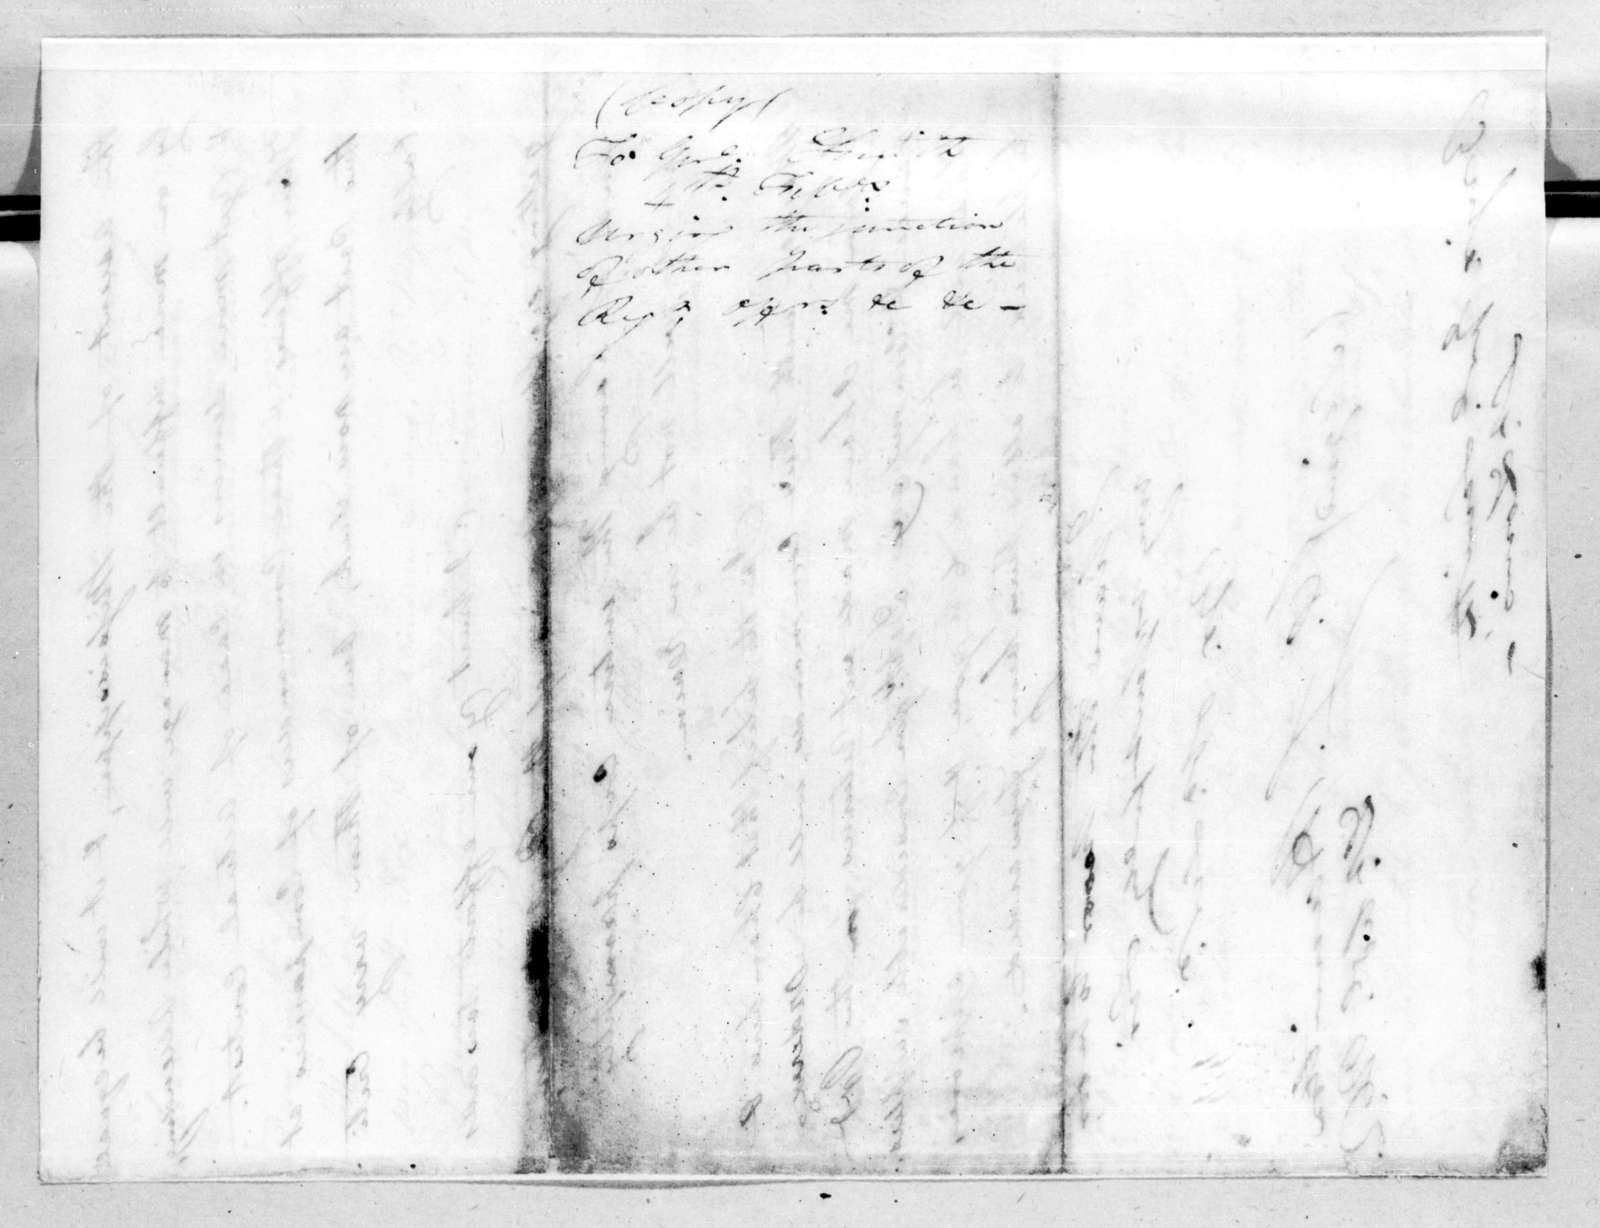 William Southerland Hamilton to Thomas Adams Smith, February 4, 1816